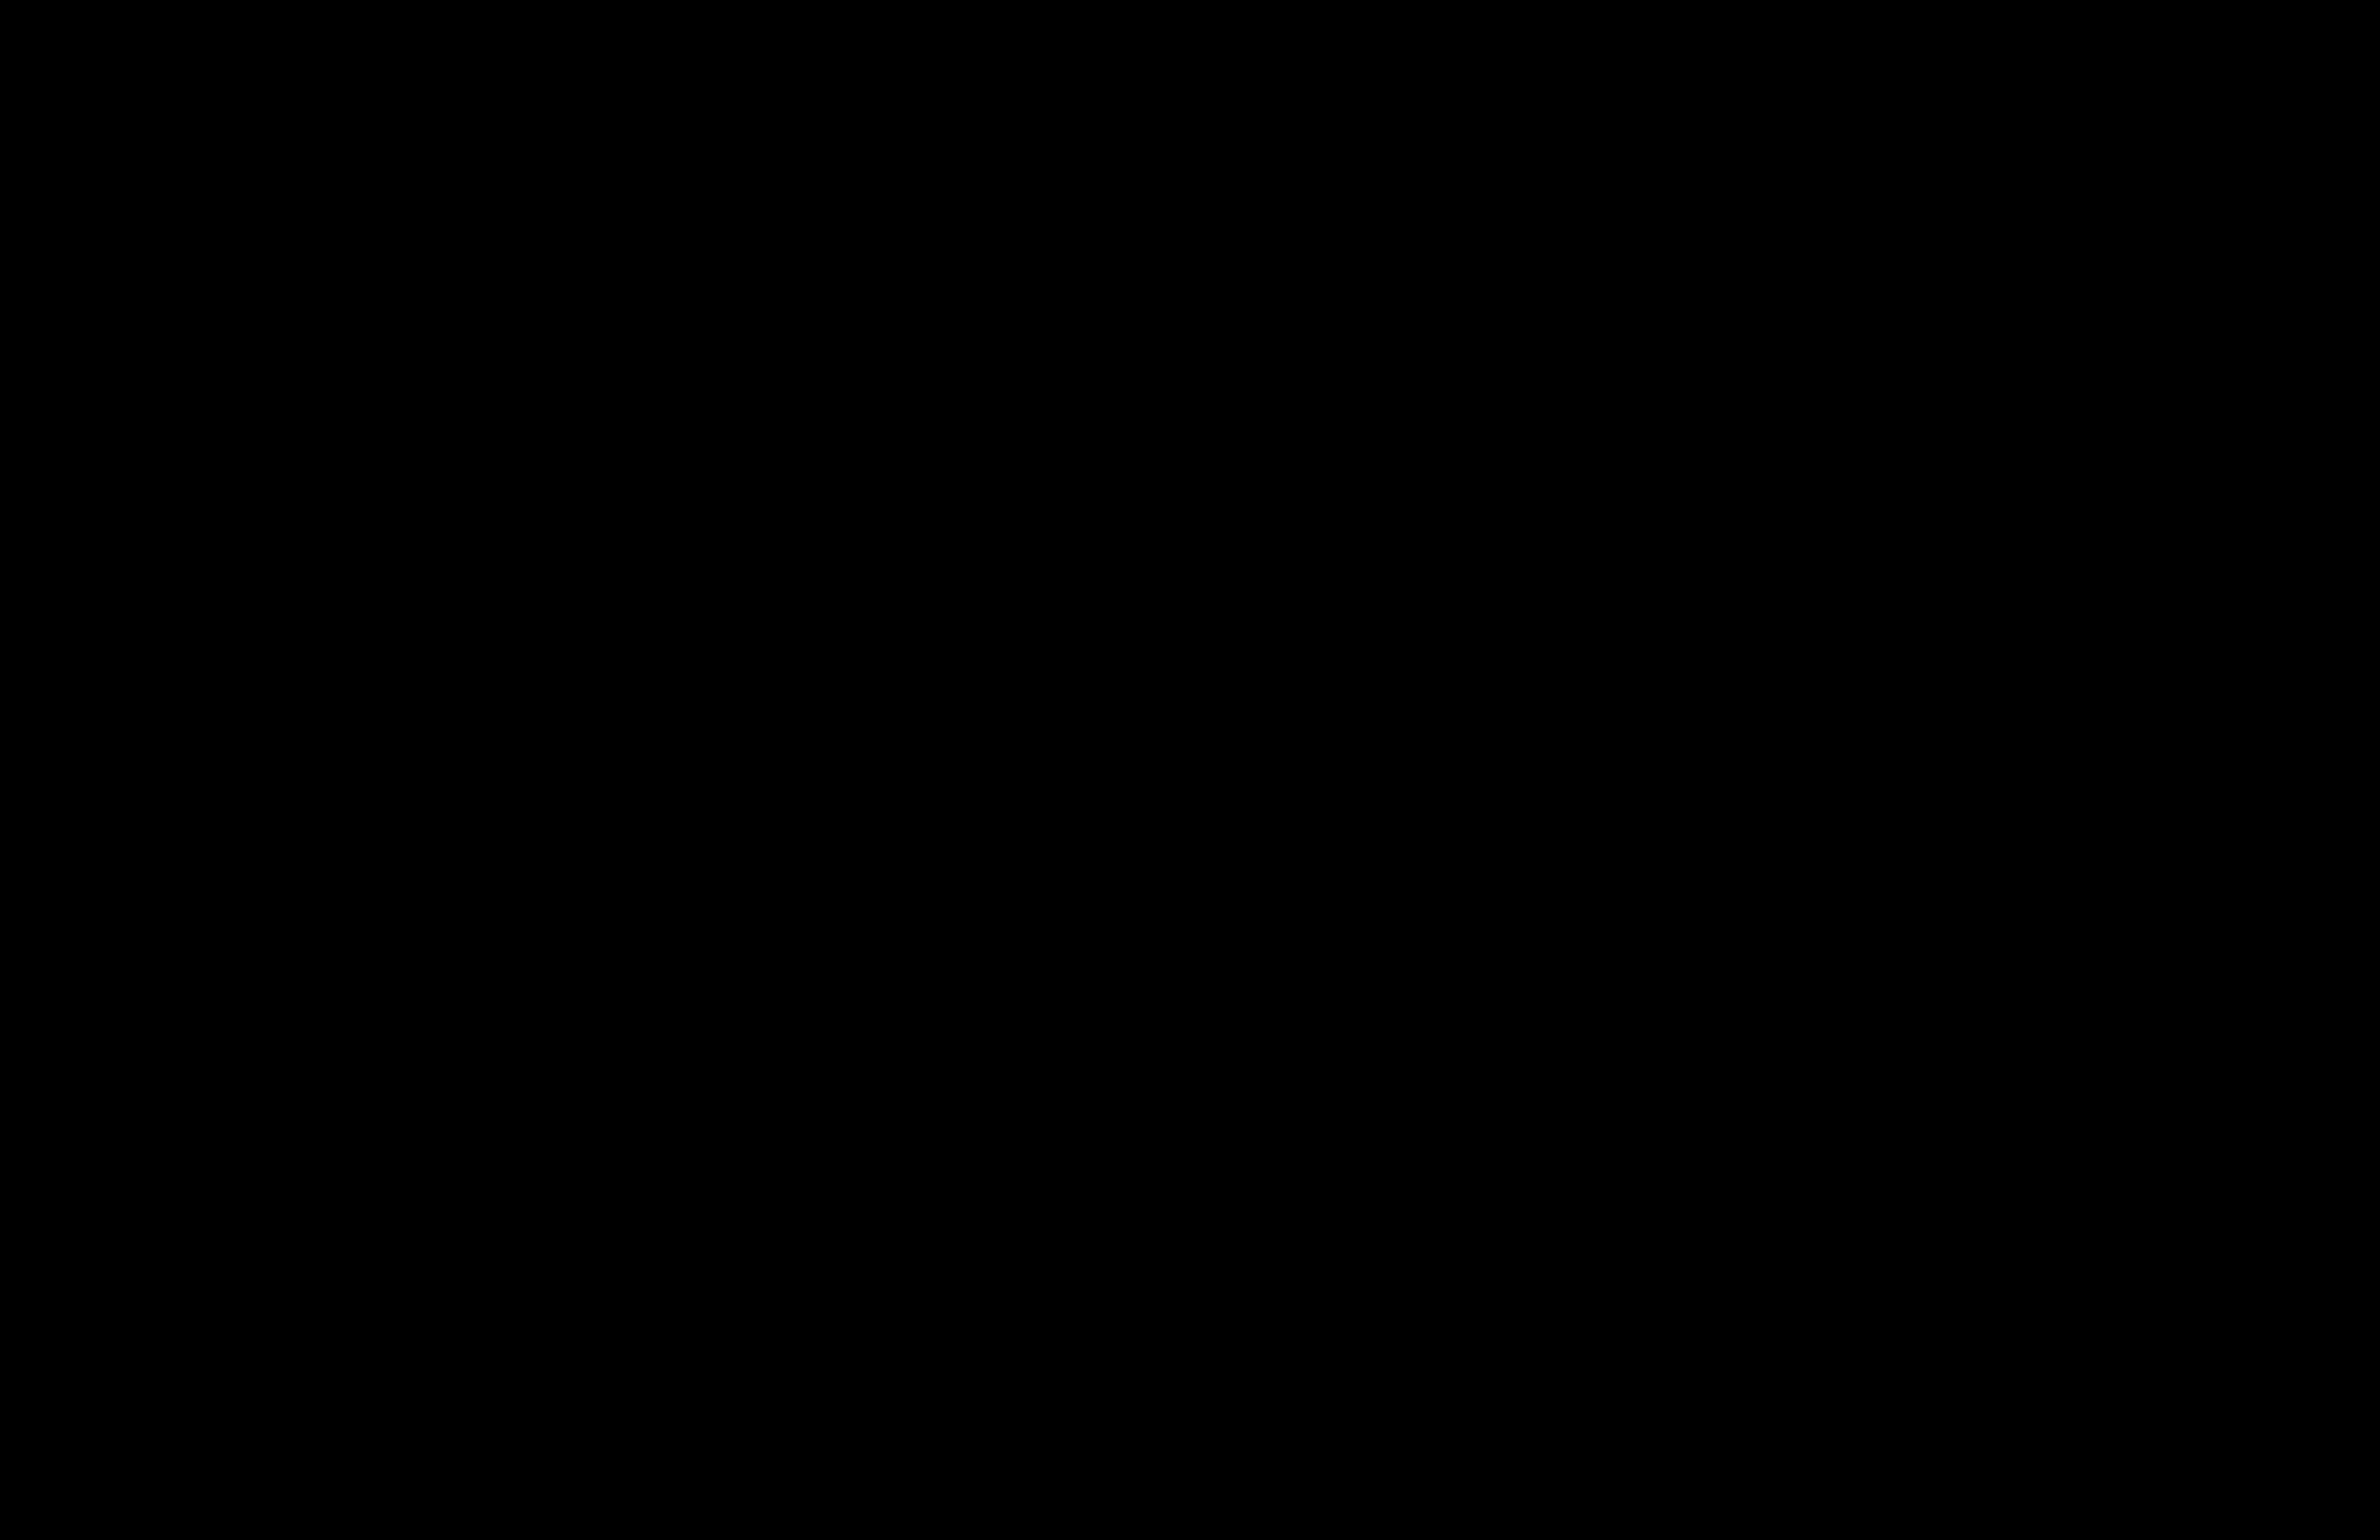 NEW_CI_Logo-01.png